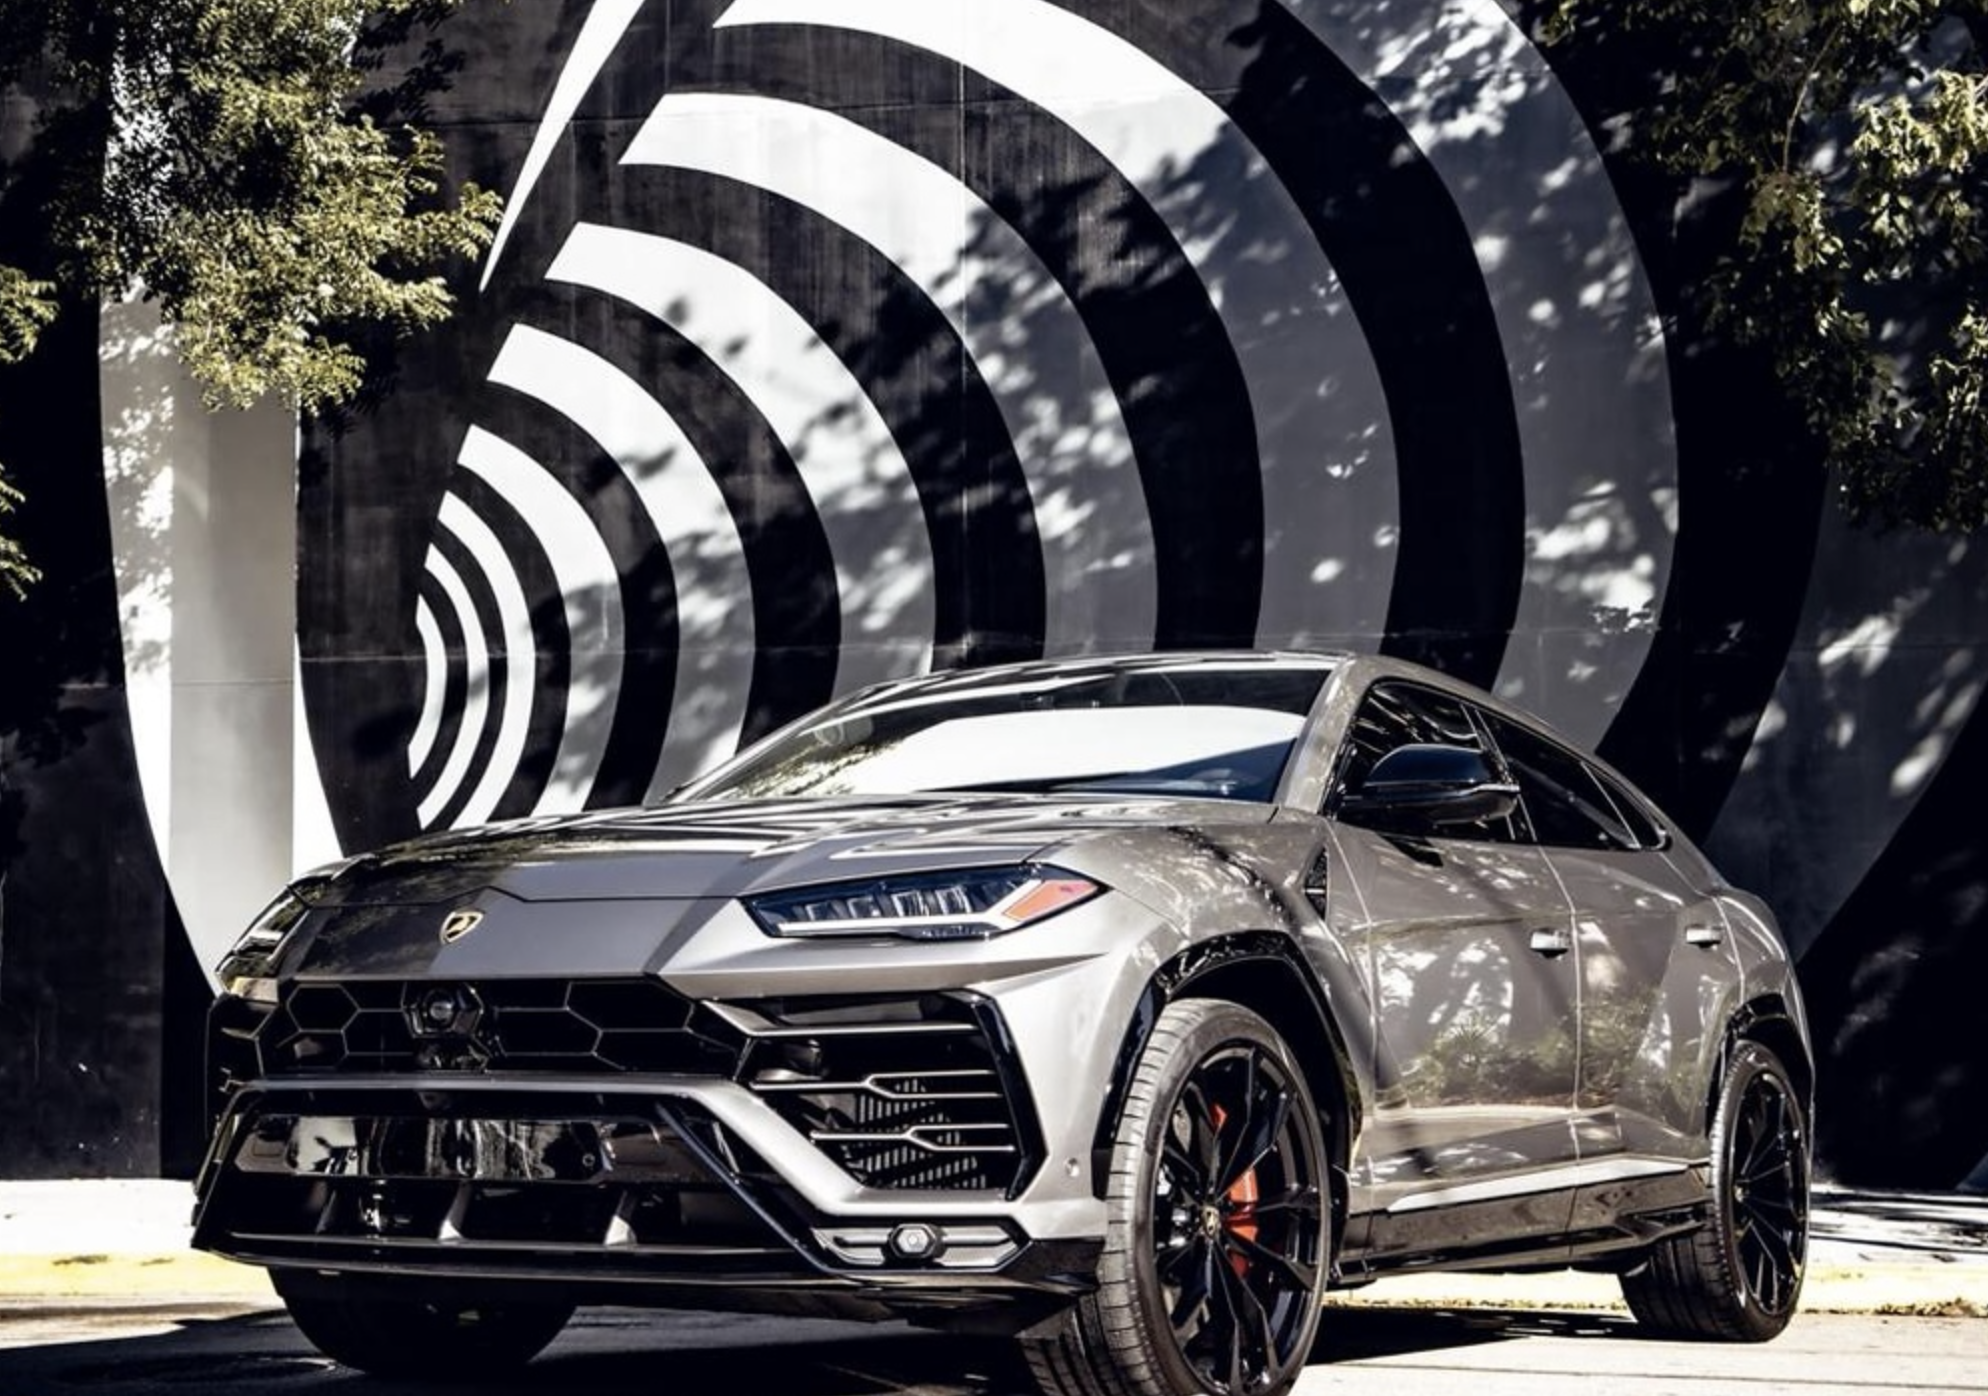 Image #7 of our  2021 Lamborghini Urus - Silver    In Miami Fort Lauderdale Palm Beach South Florida